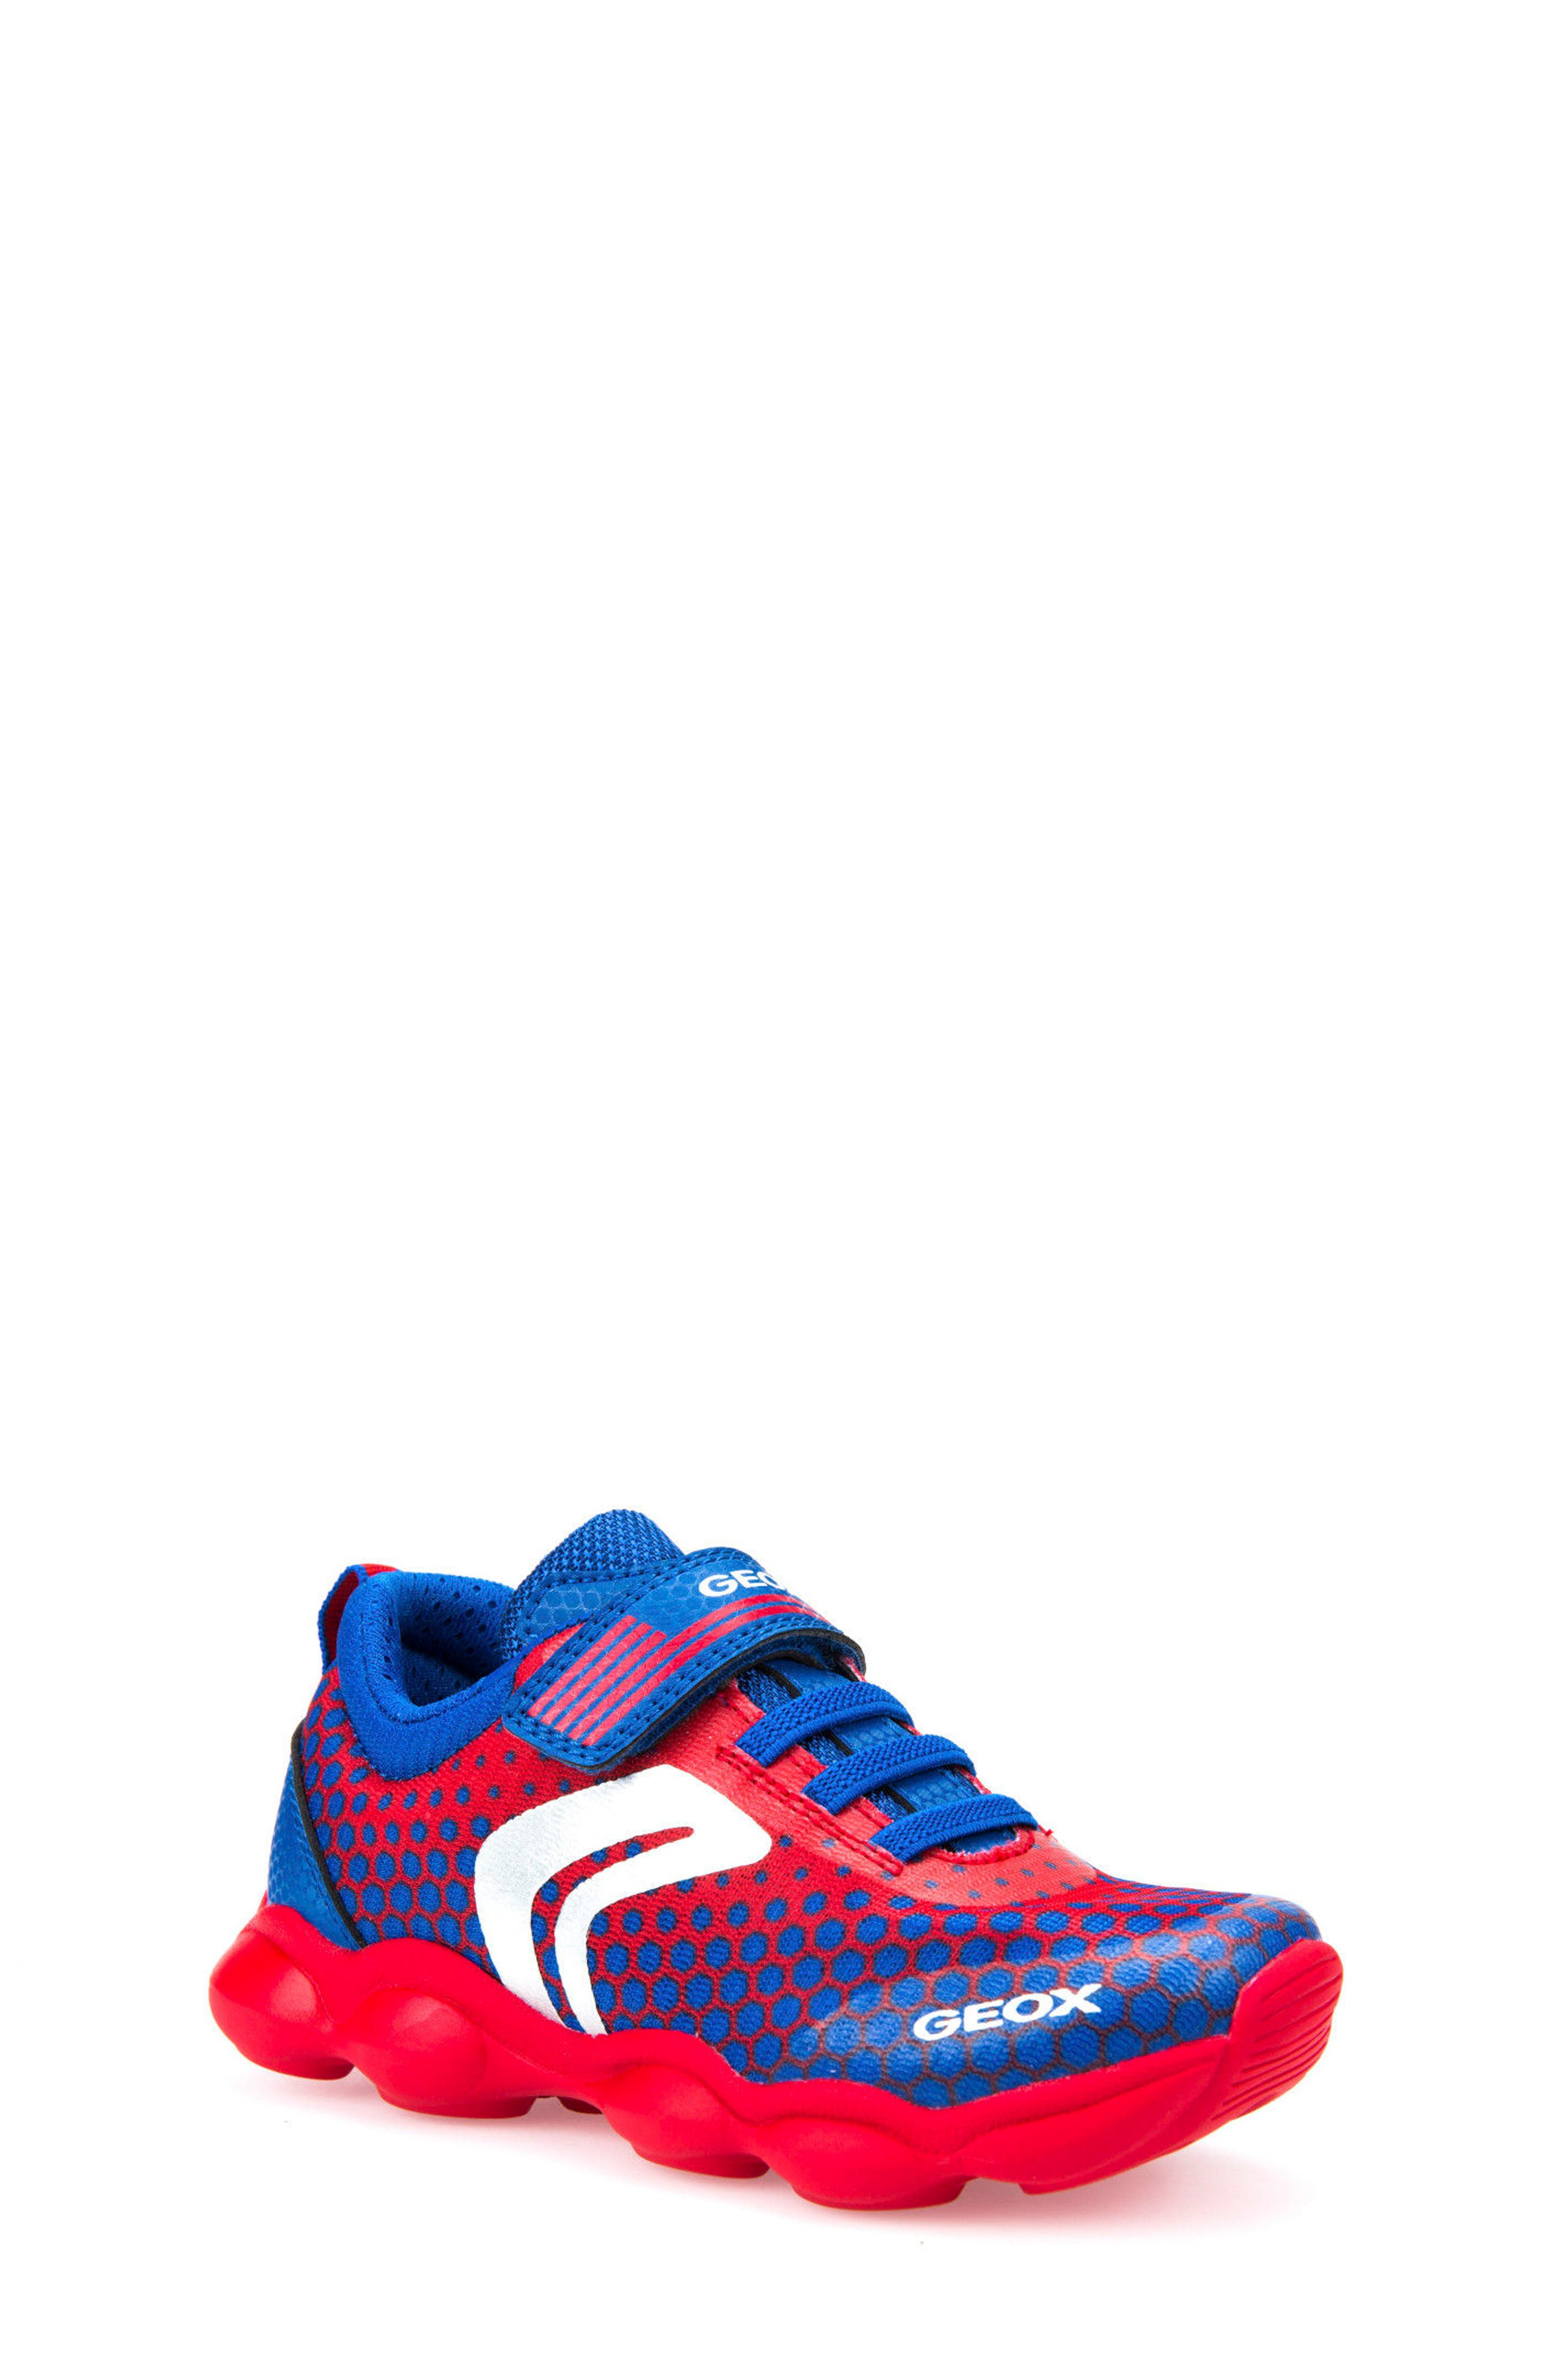 Alternate Image 1 Selected - Geox Munfrey Sneaker (Toddler, Little Kid, Big Kid)